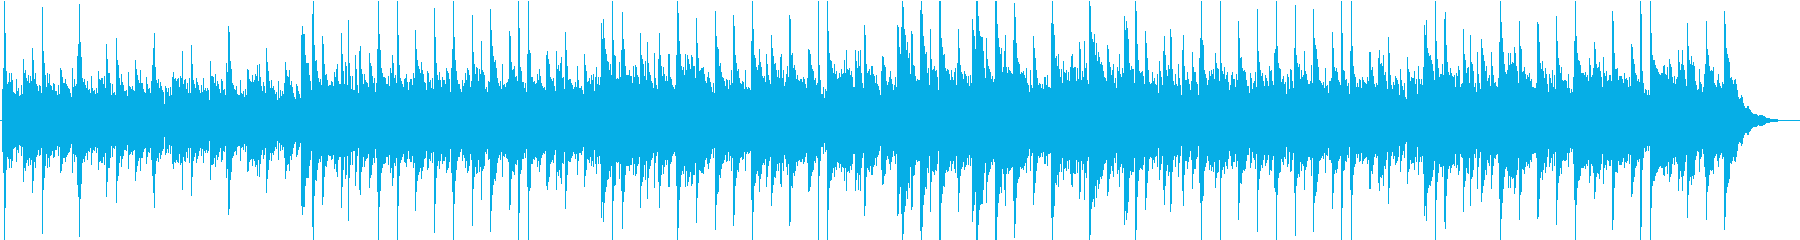 vlog・ピアノとアコギでしっとりの再生済みの波形